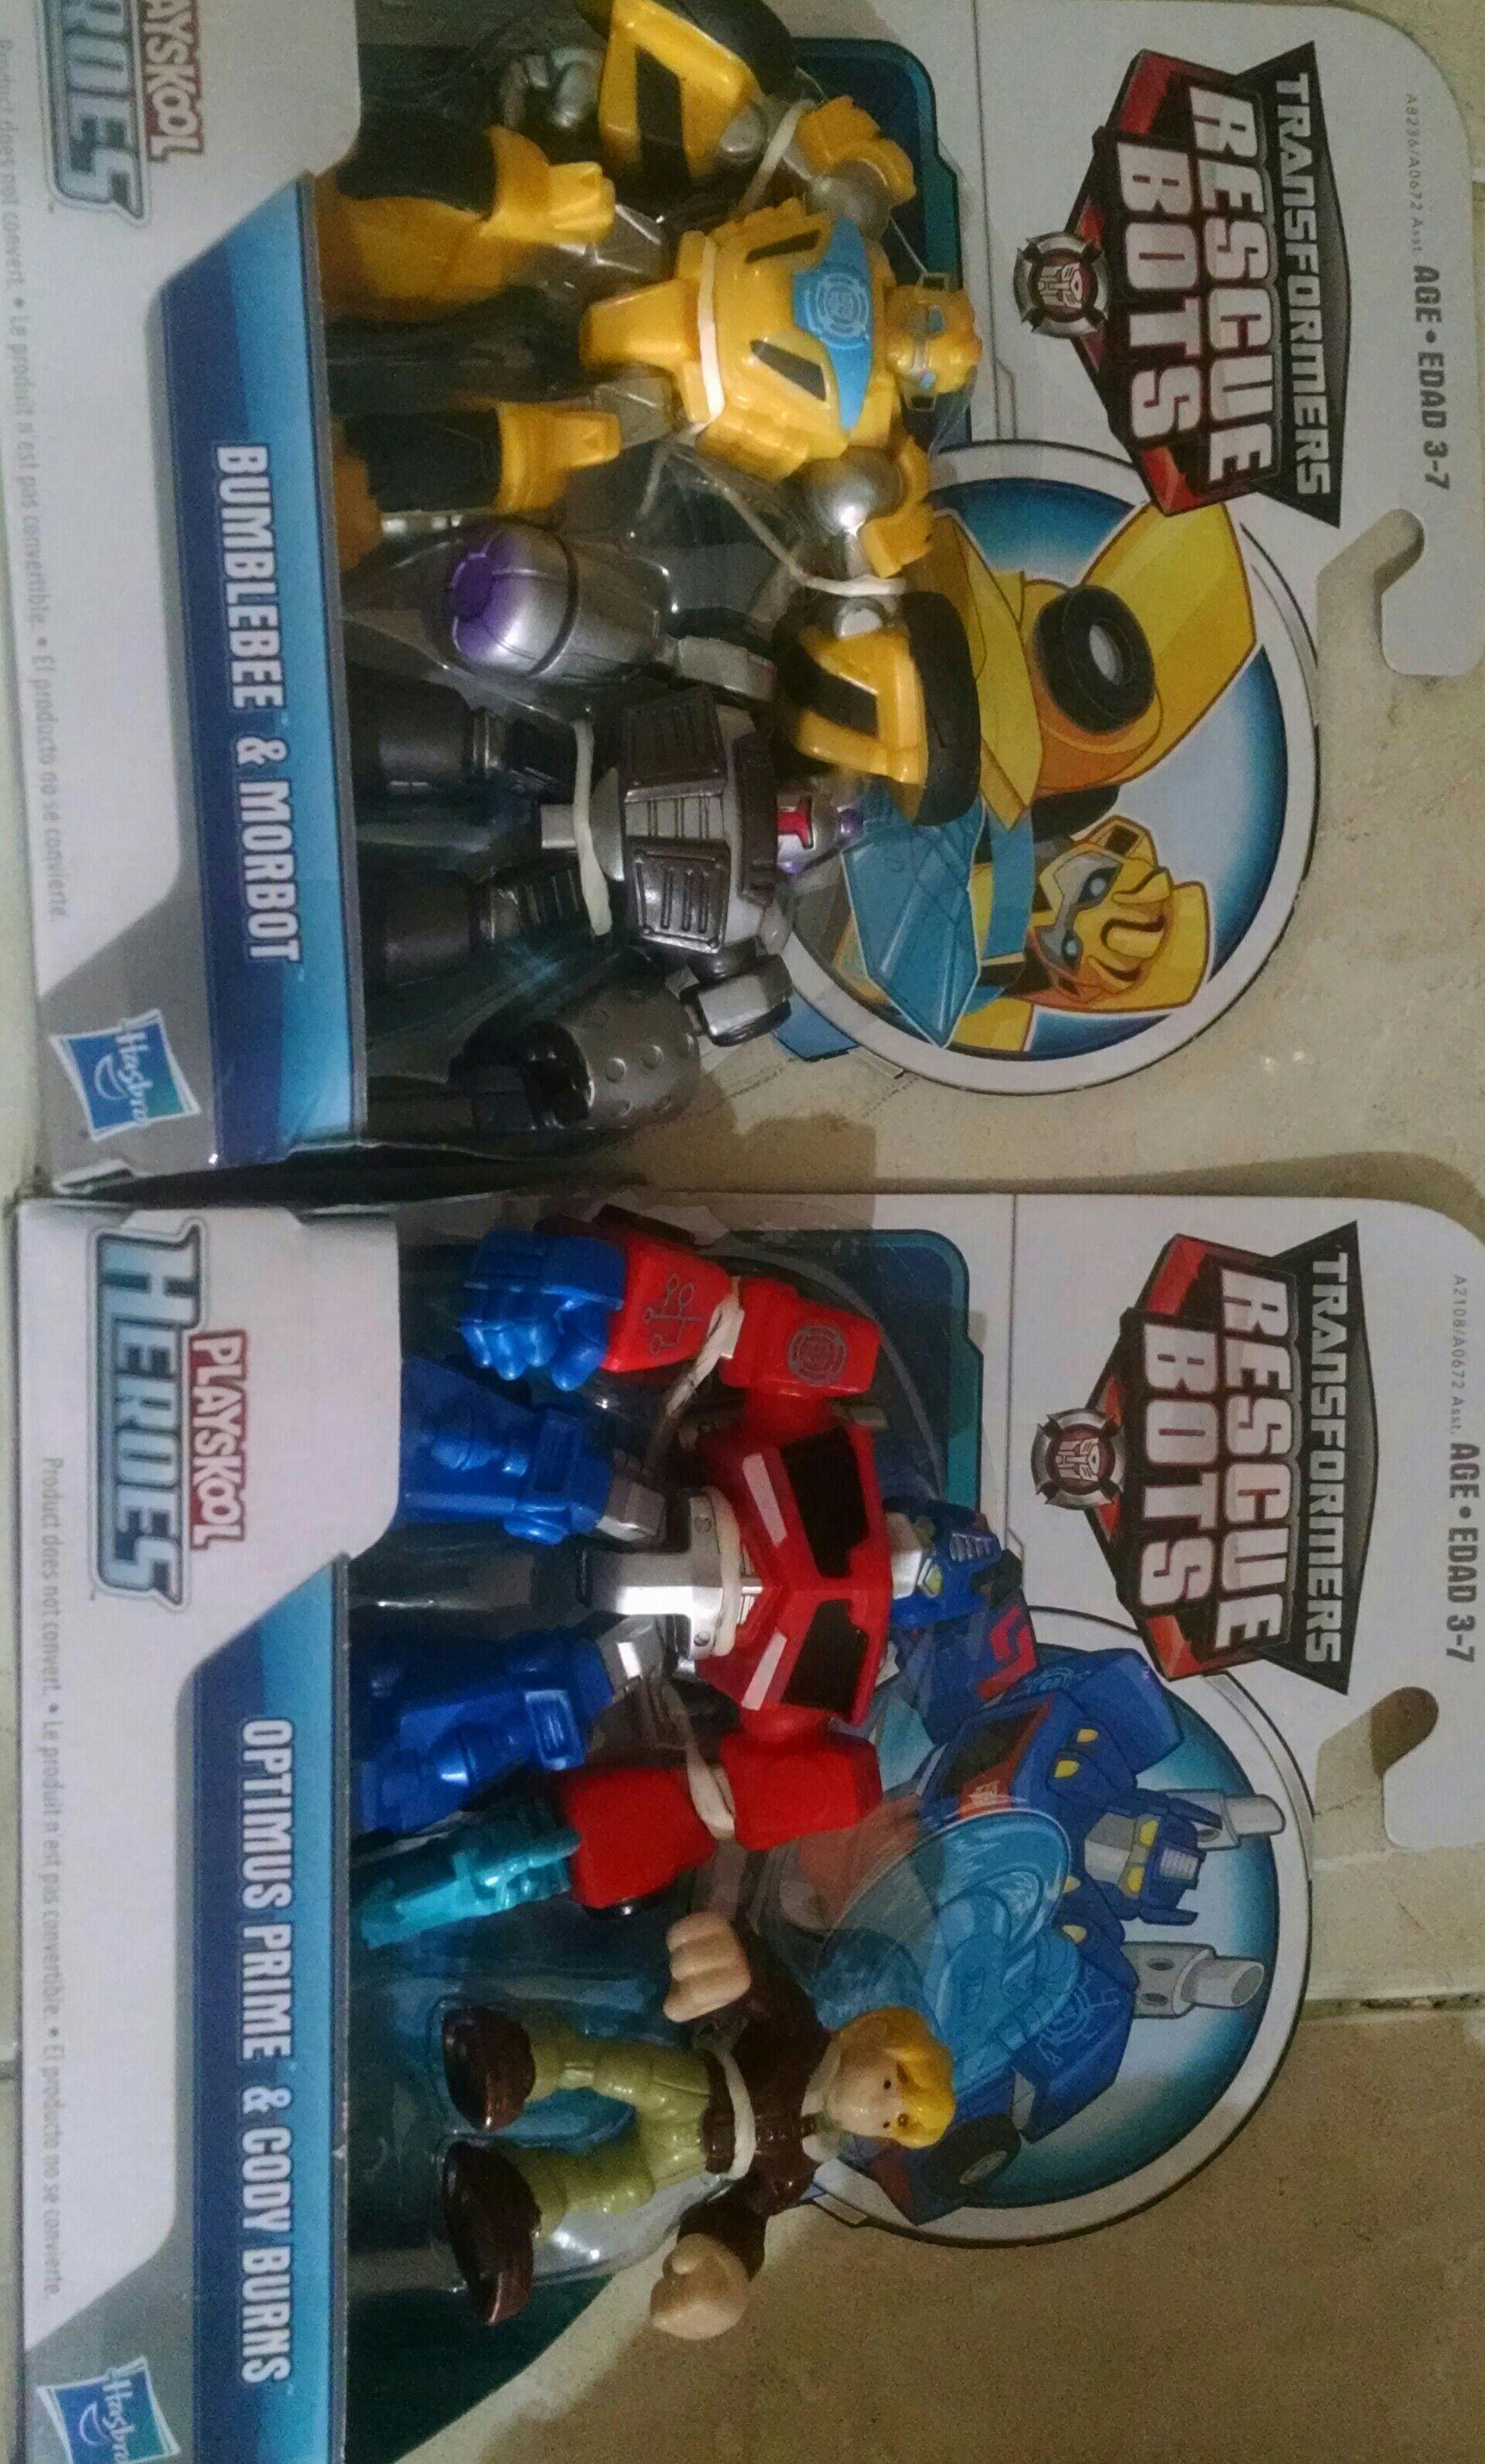 Chedraui Playa del Carmen Américas: juguetes Transformers Rescue Bots Playskool Heroes